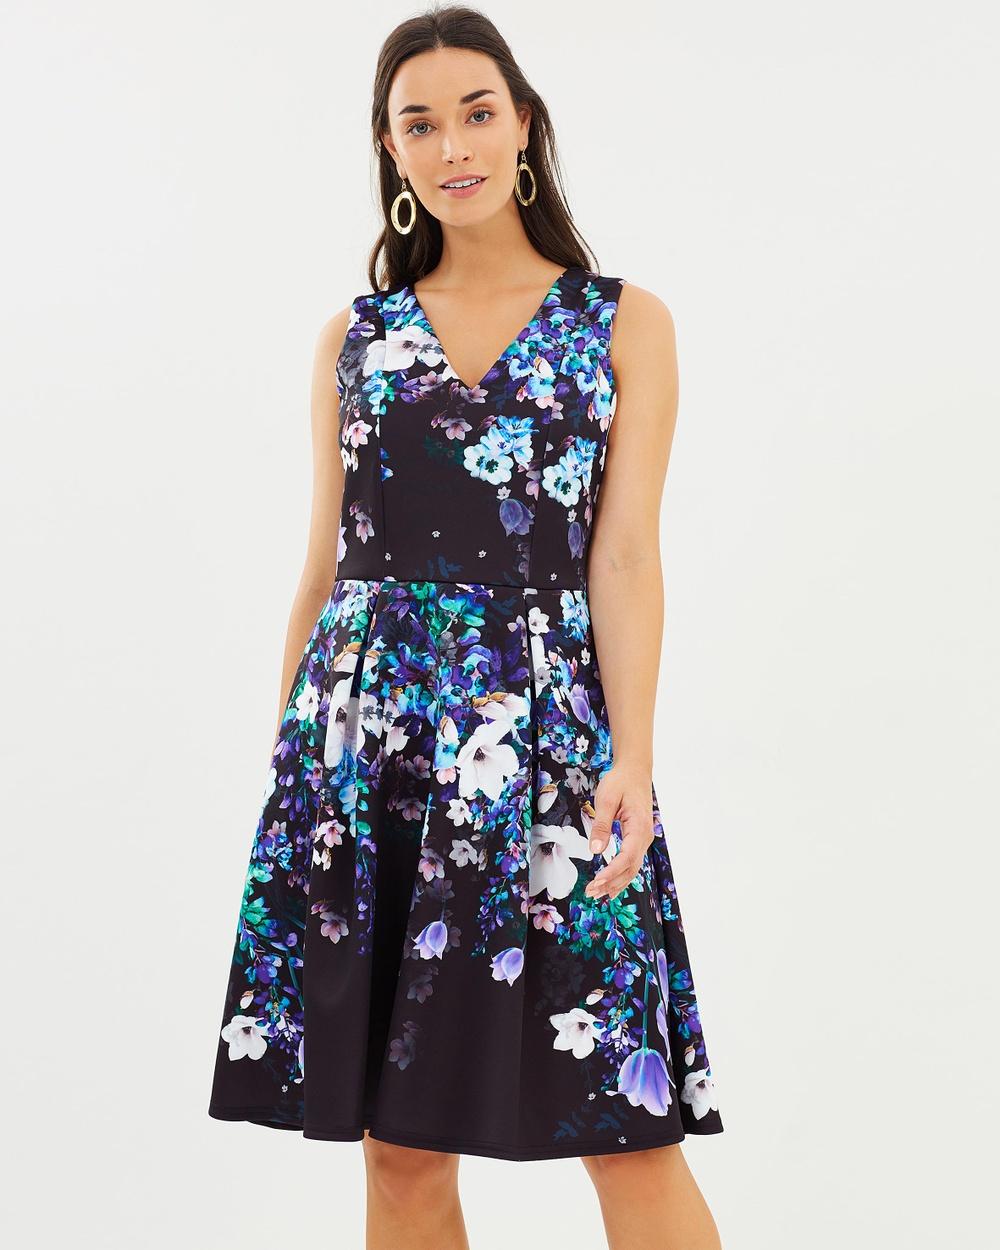 Wallis Floral Blossom Scuba Dress Printed Dresses Navy Blue Floral Blossom Scuba Dress